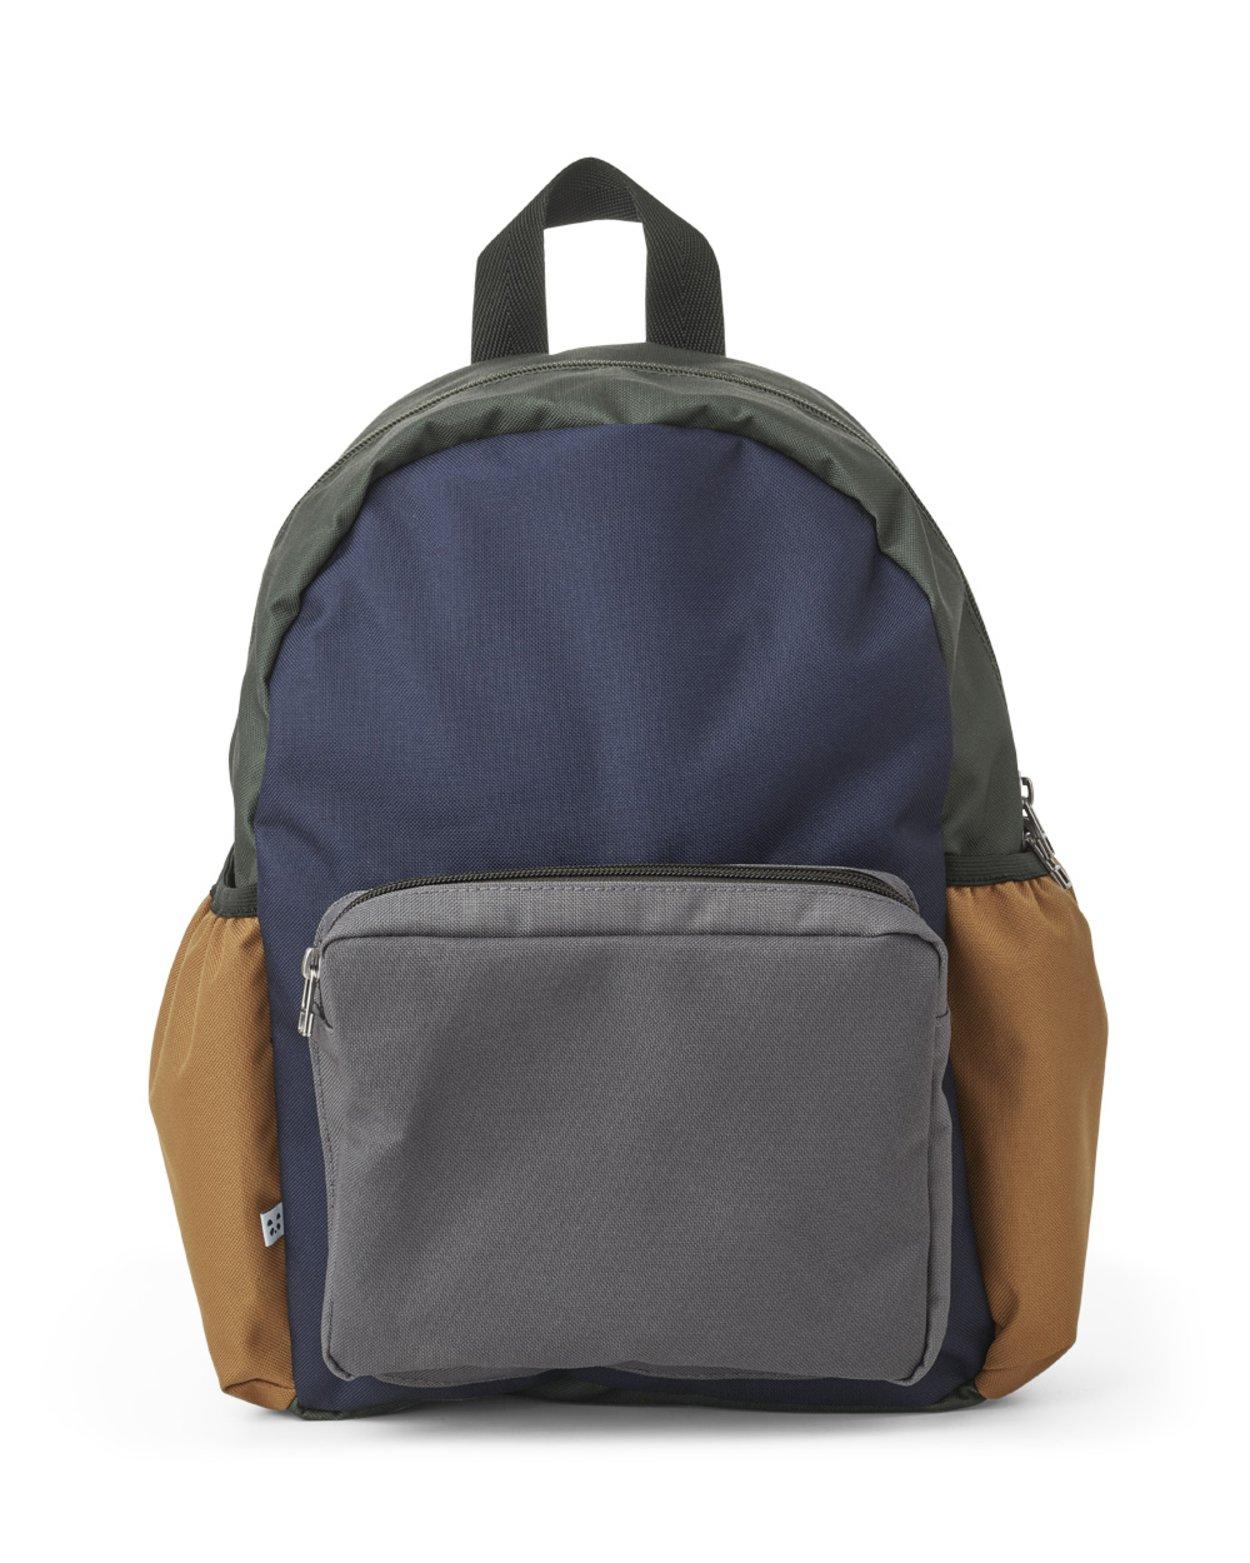 Wally Backpack